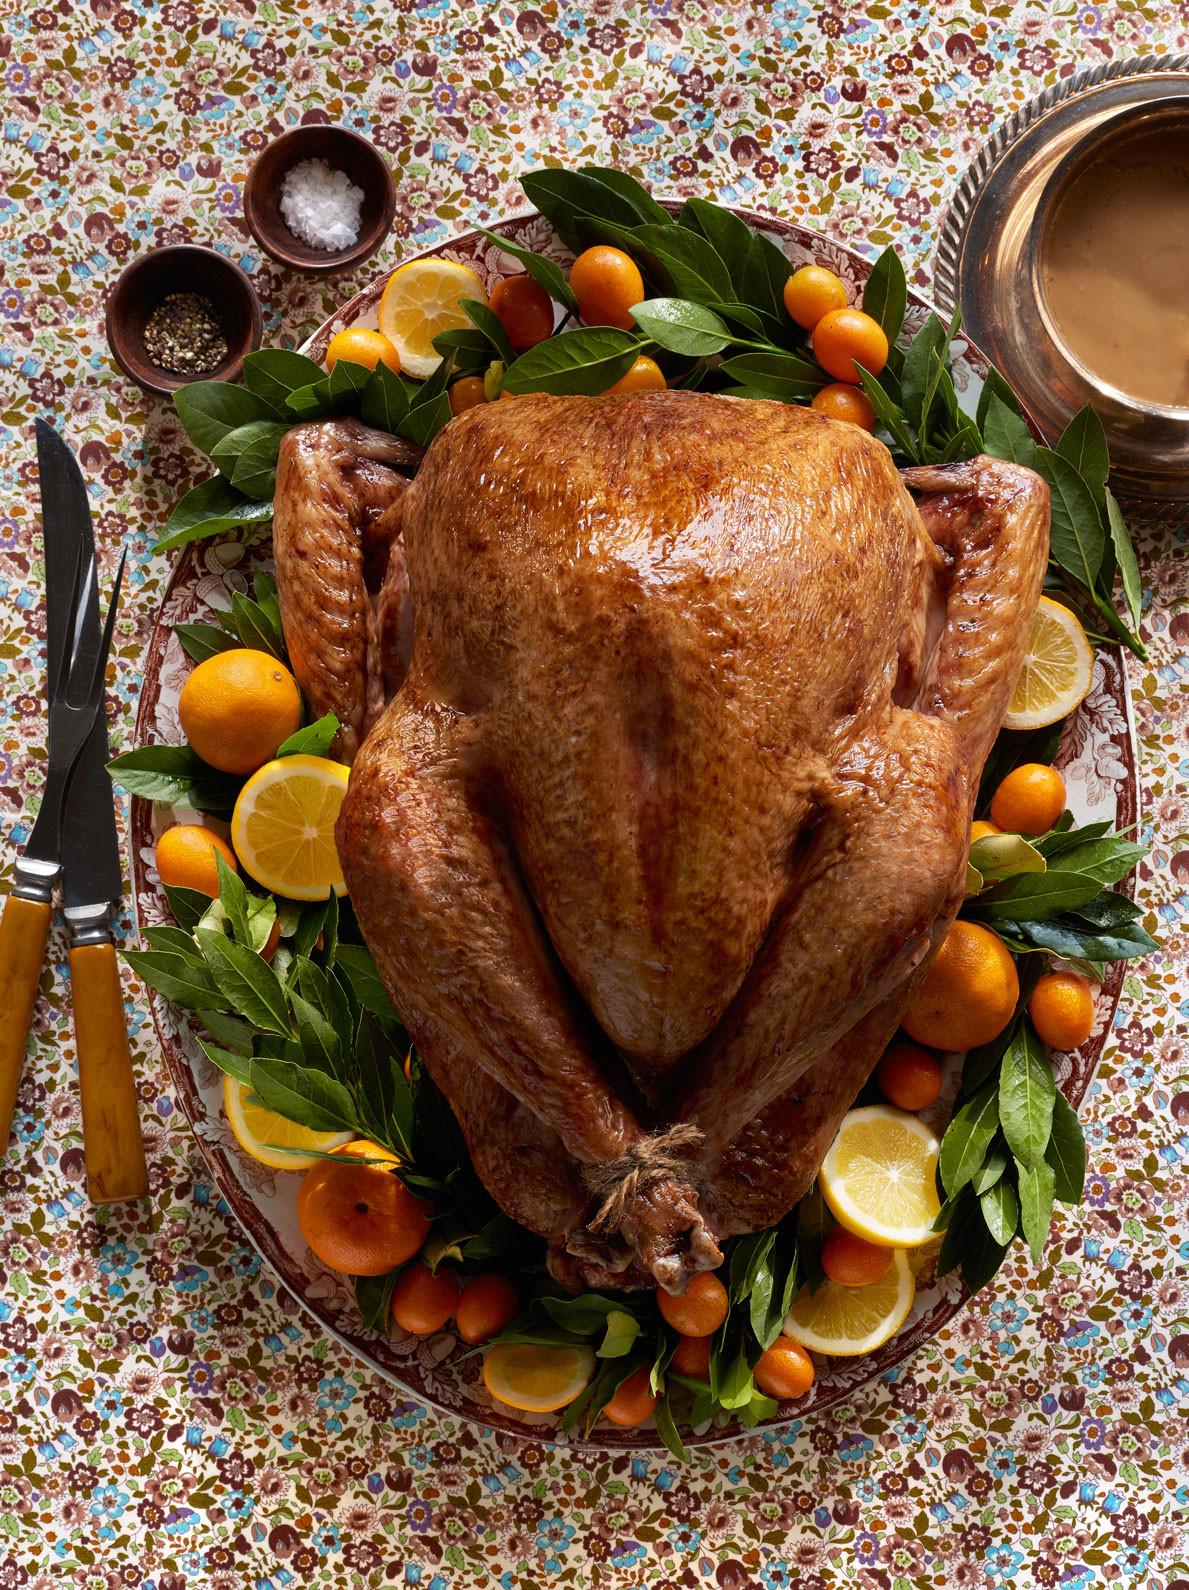 Cooking Thanksgiving Turkey  25 Best Thanksgiving Turkey Recipes How To Cook Turkey